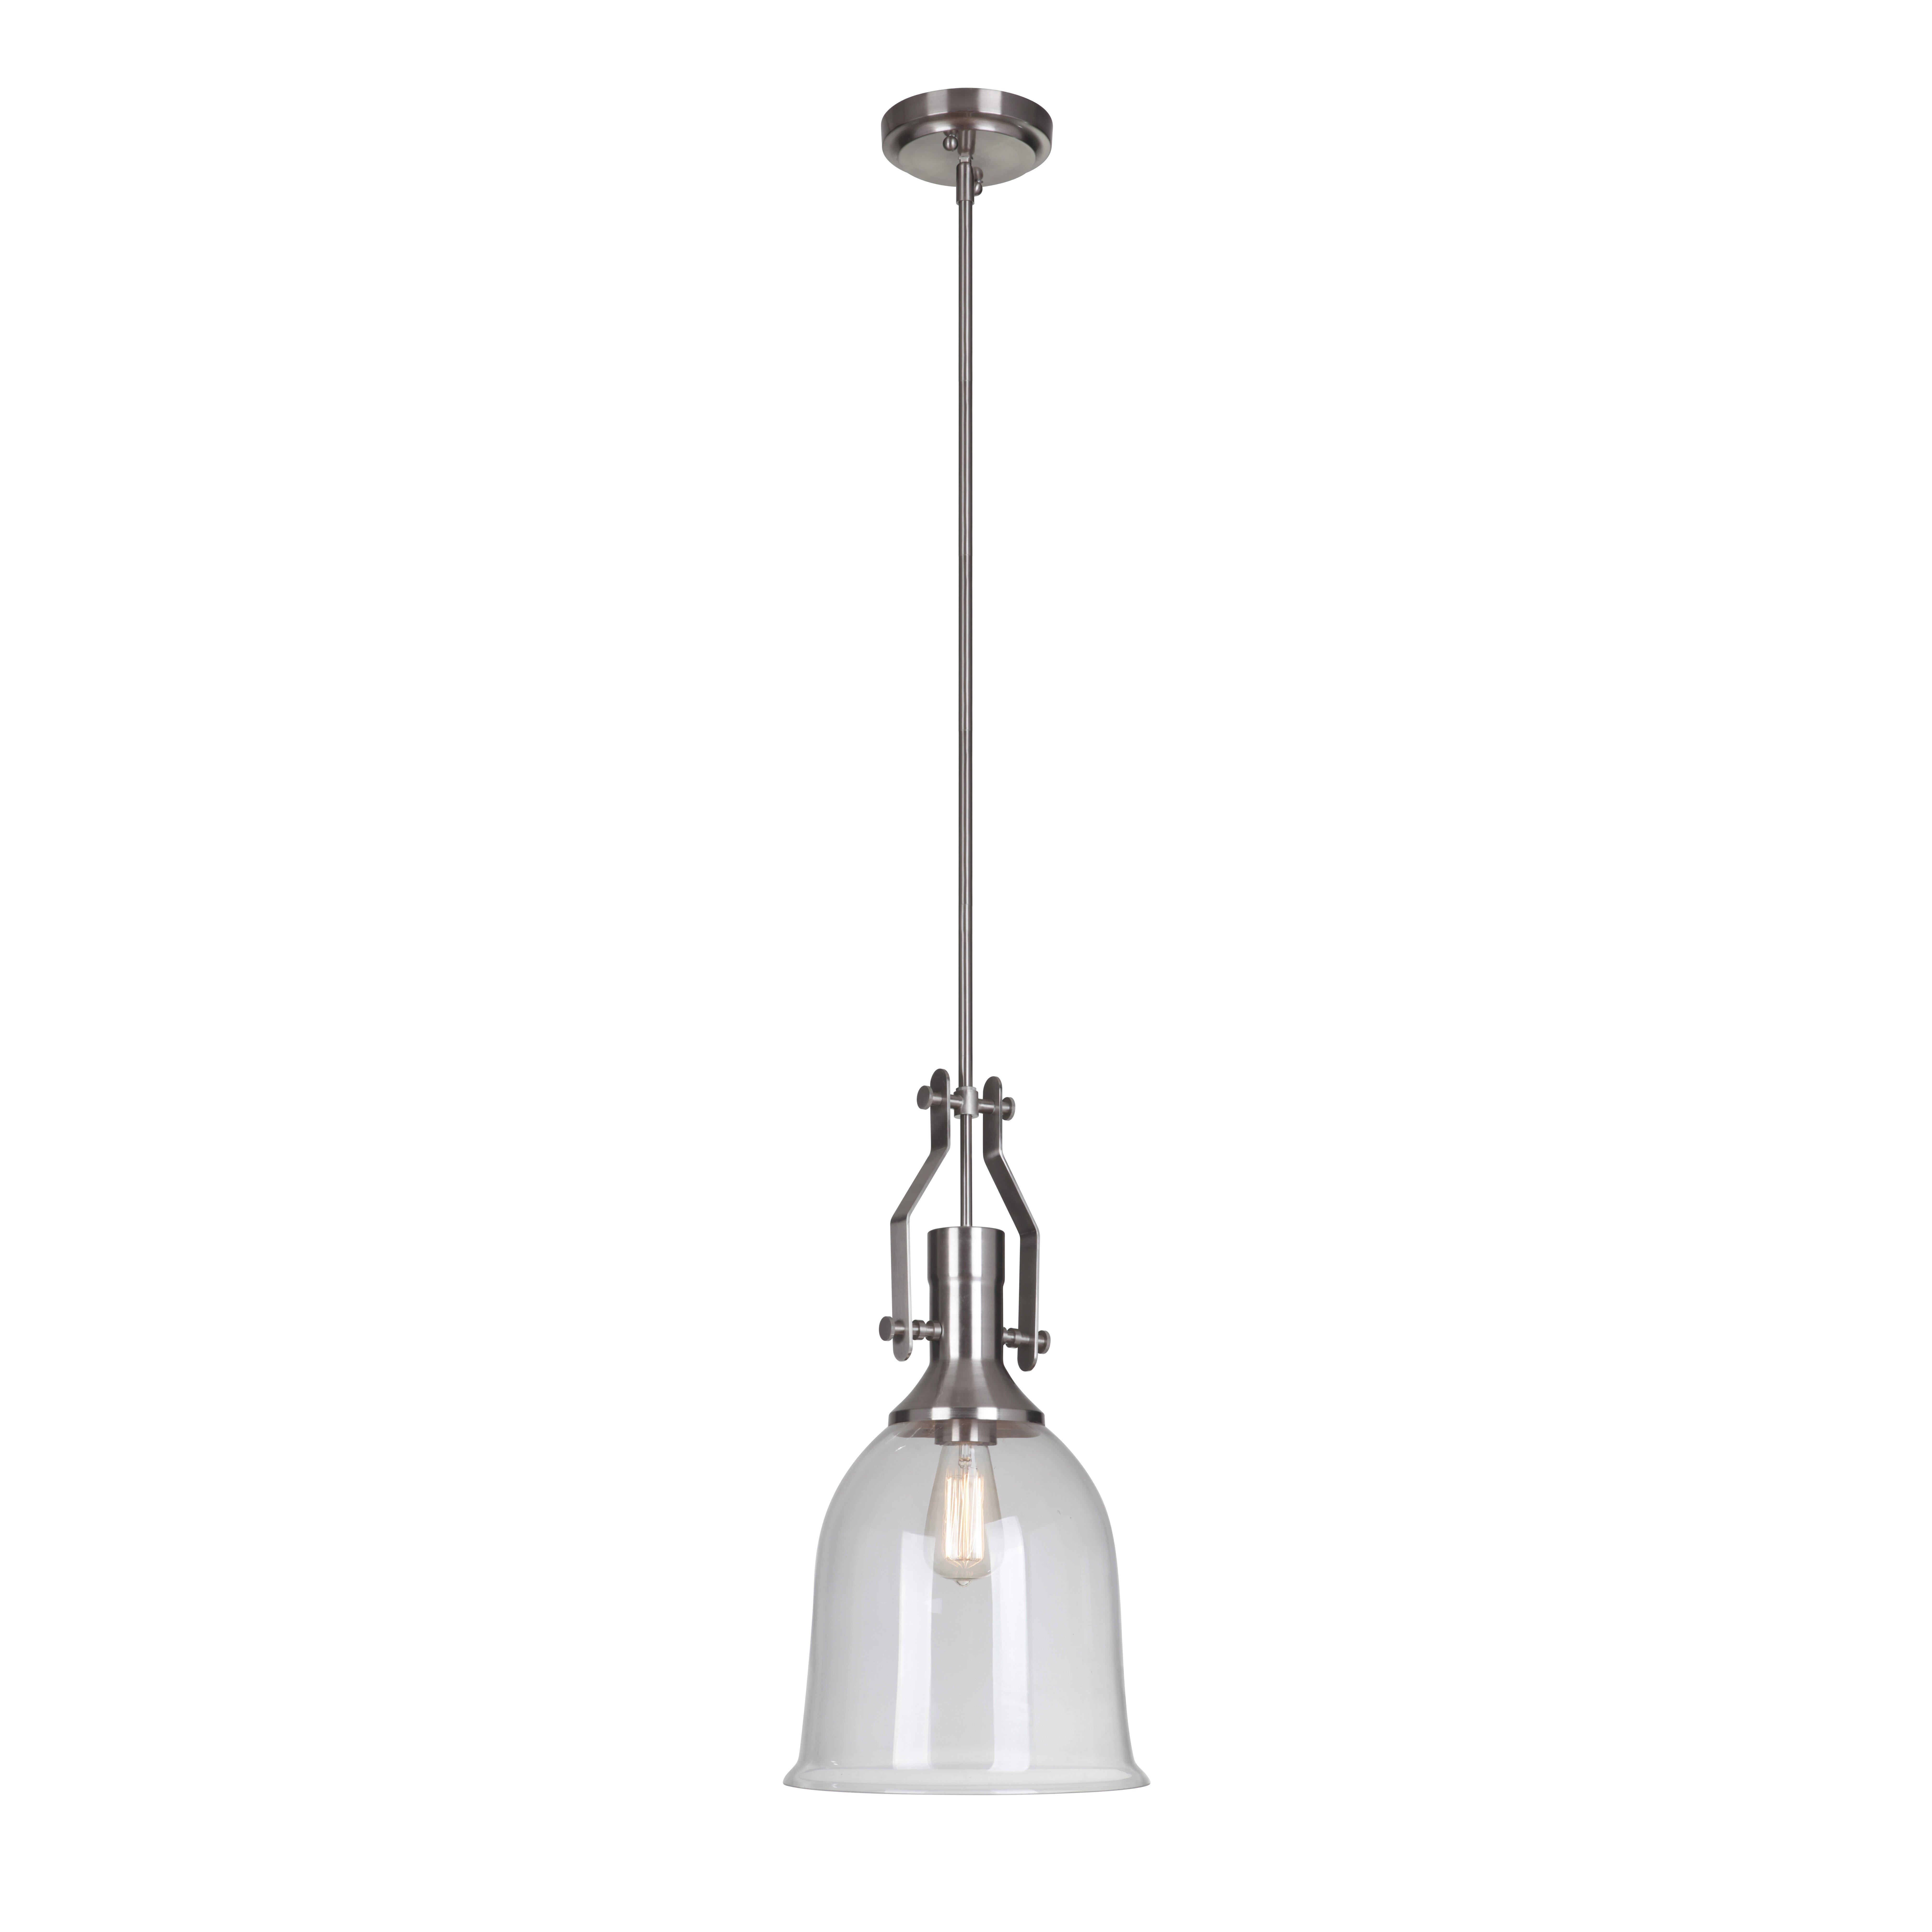 lighting ceiling lights pendants jeremiah sku jrmh2021